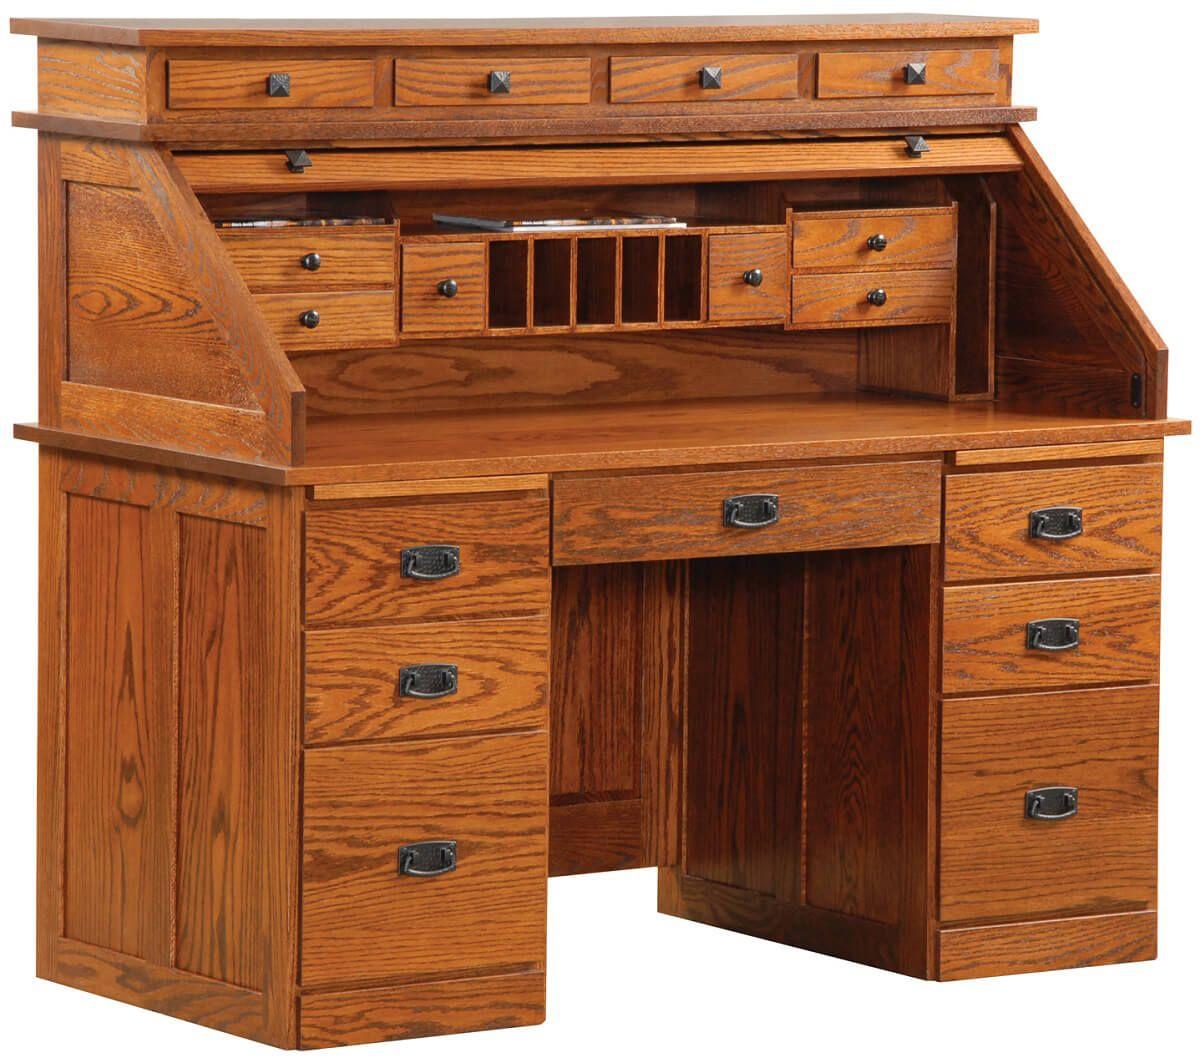 Banker's Roll Top Desk